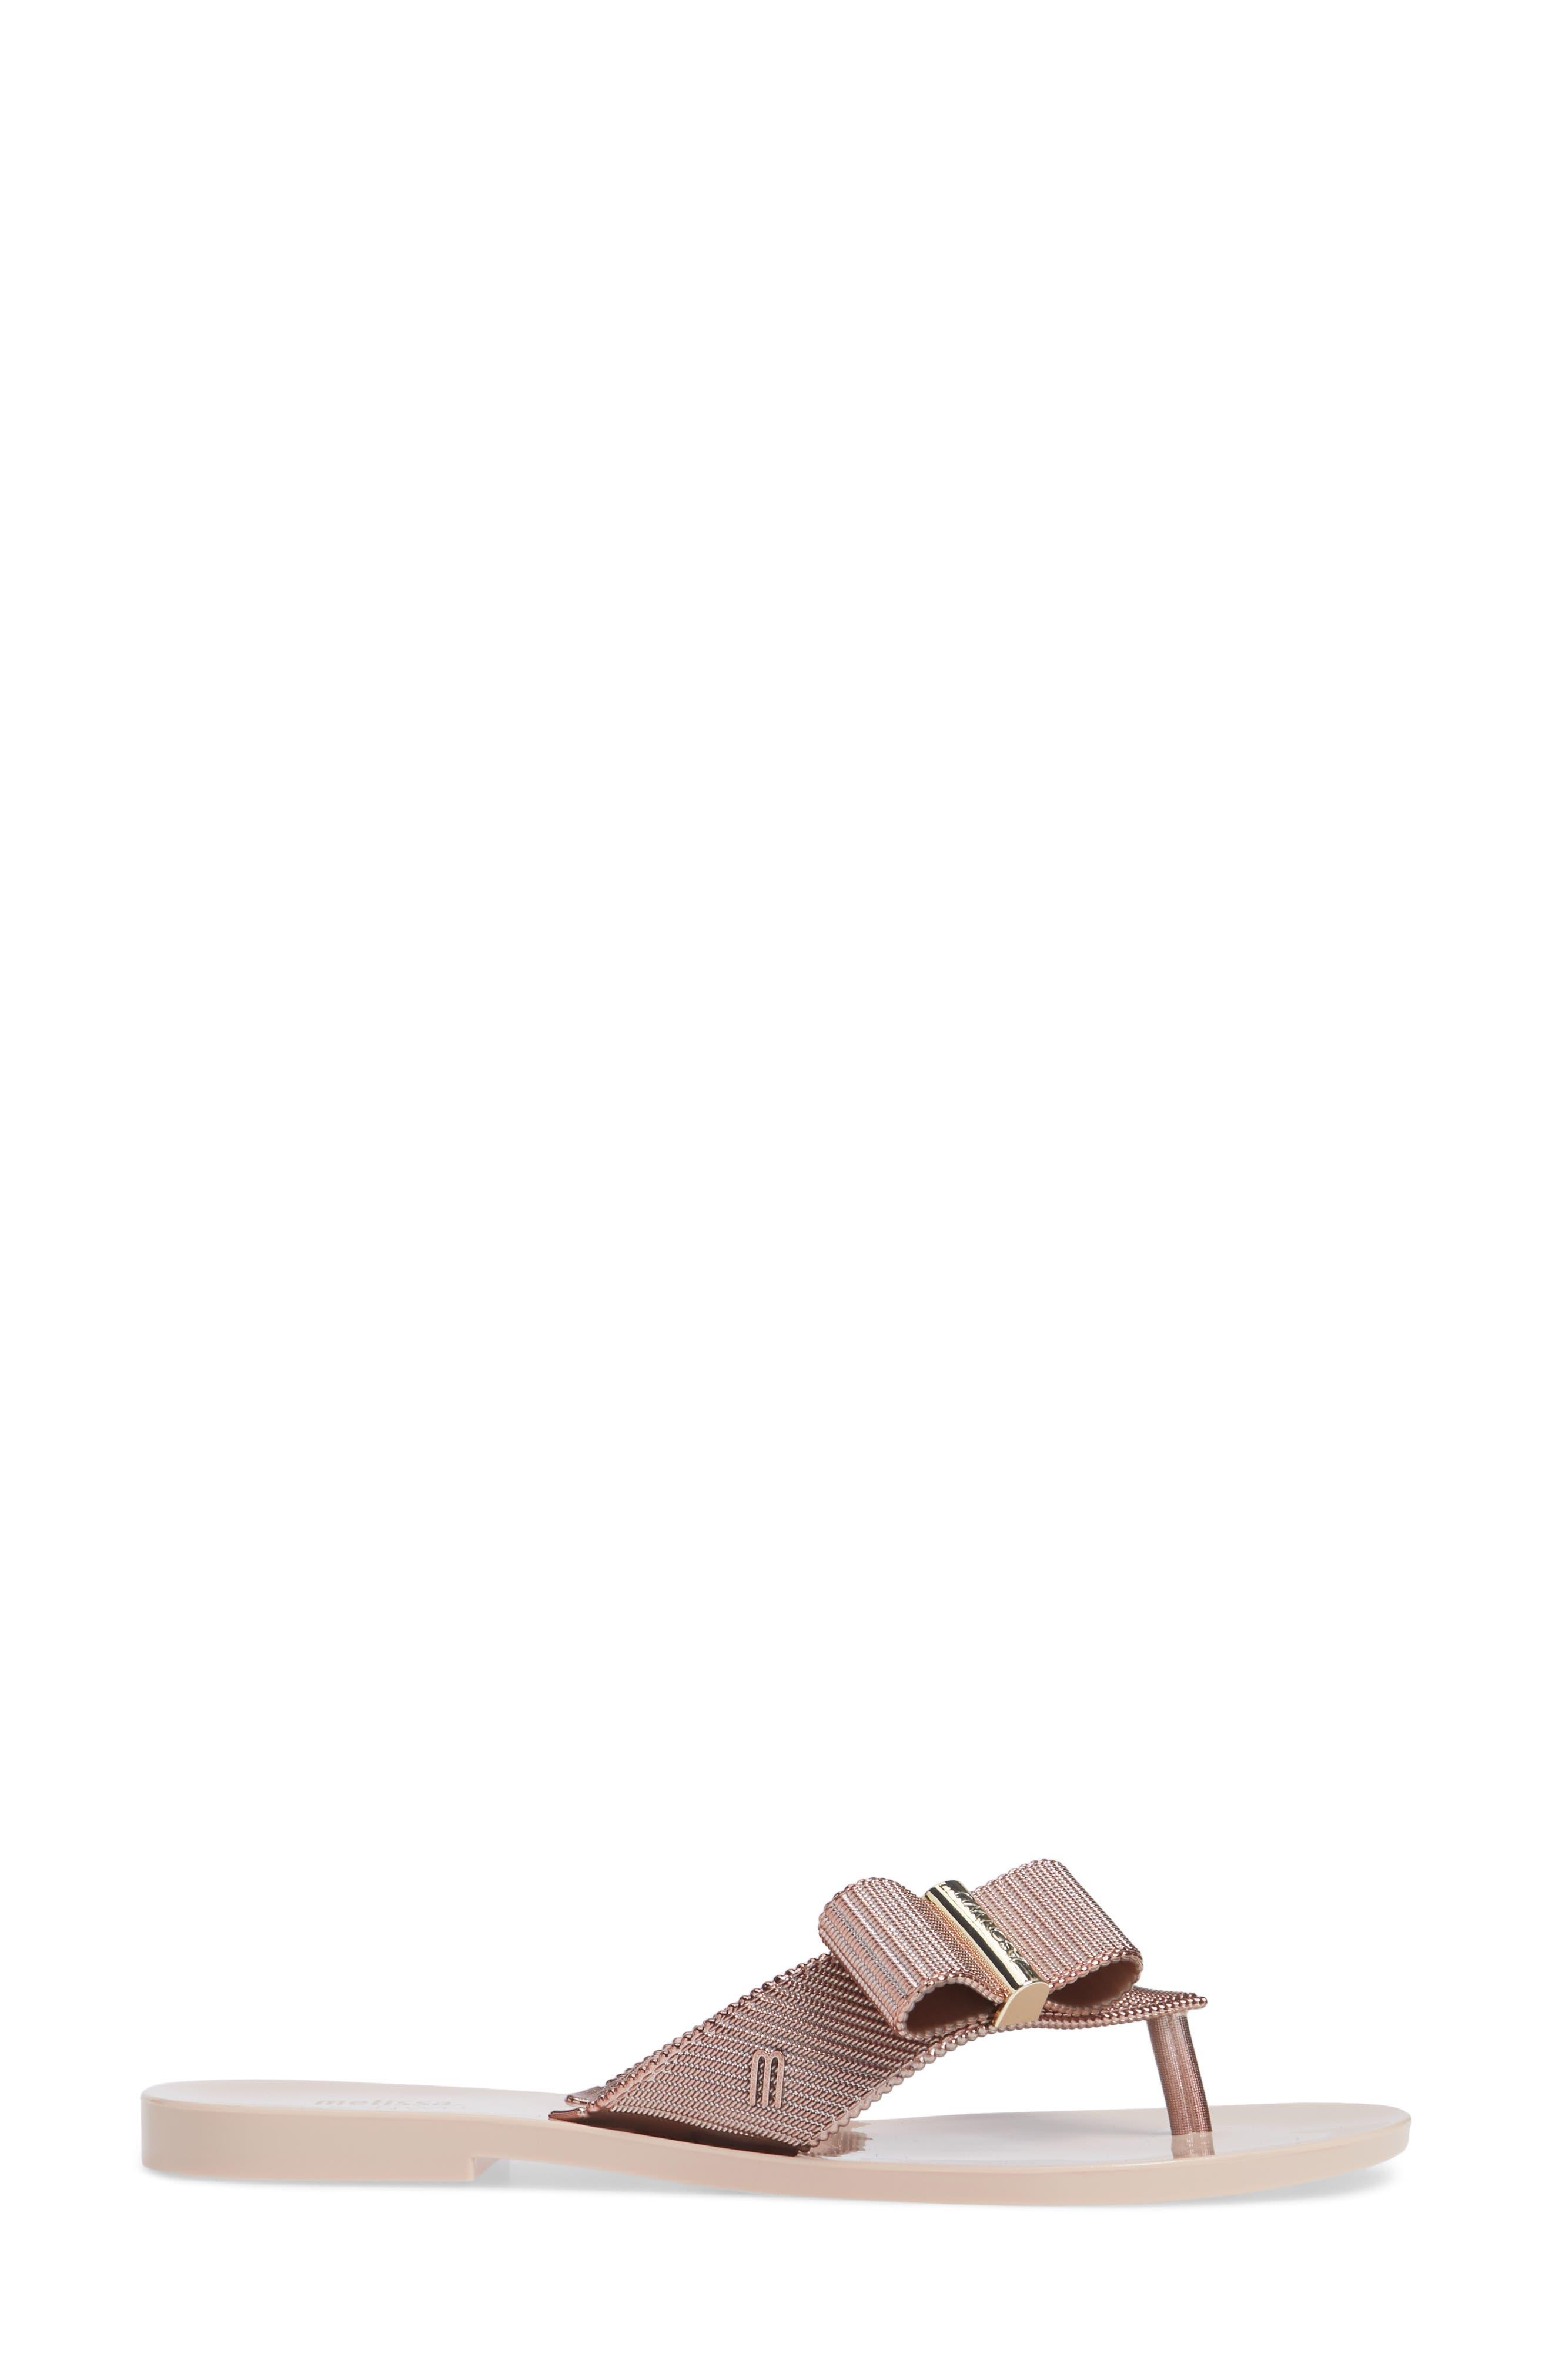 + Jason Wu Girl Chrome Flip Flop,                             Alternate thumbnail 3, color,                             ROSE GOLD